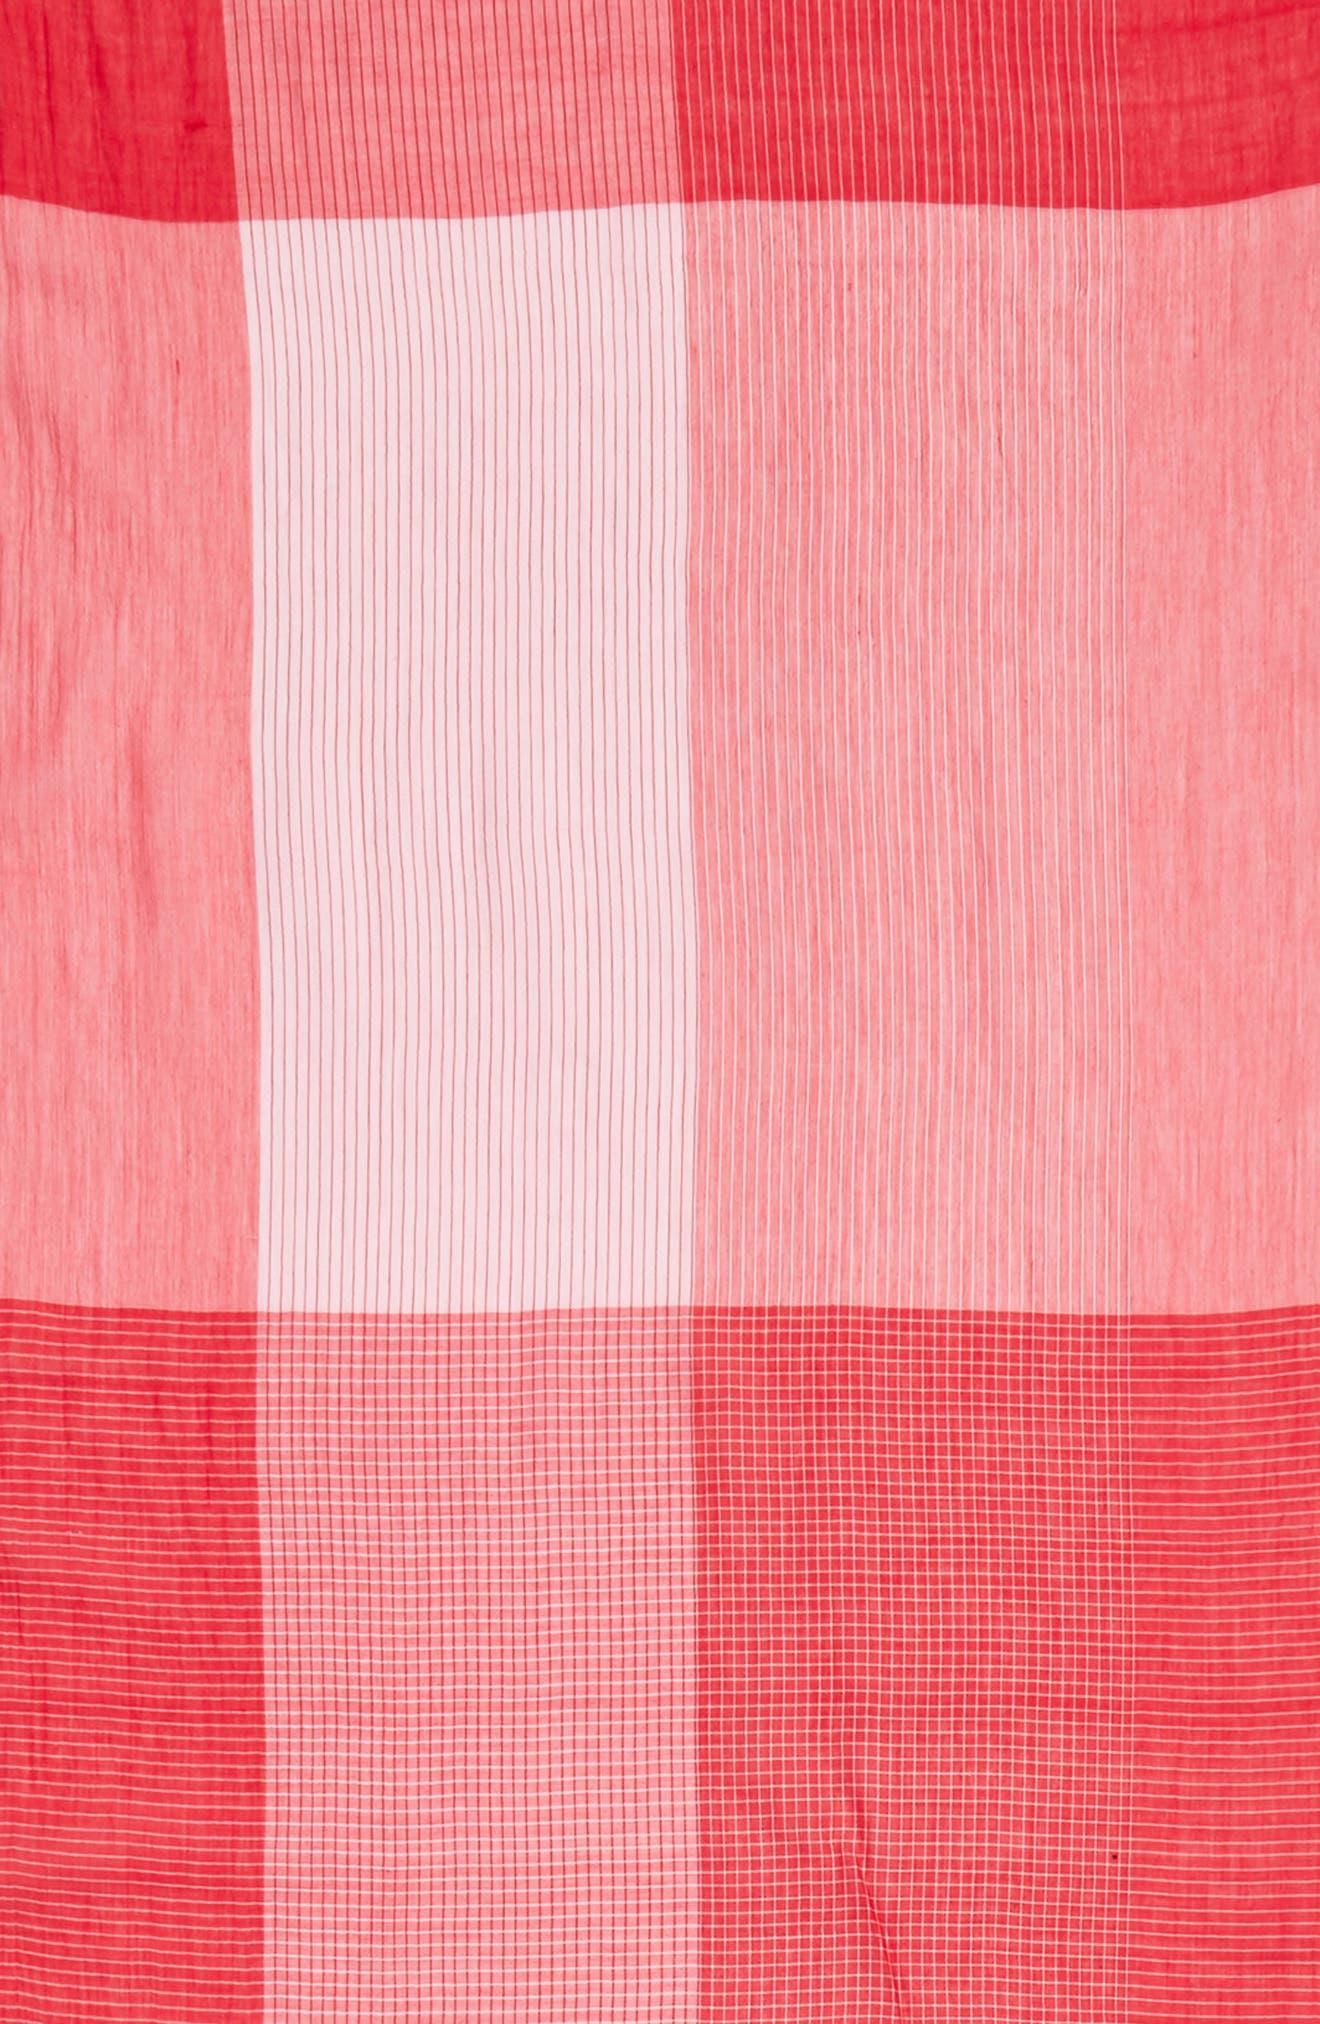 Colorblock Organic Cotton Scarf,                             Alternate thumbnail 4, color,                             Strawberry